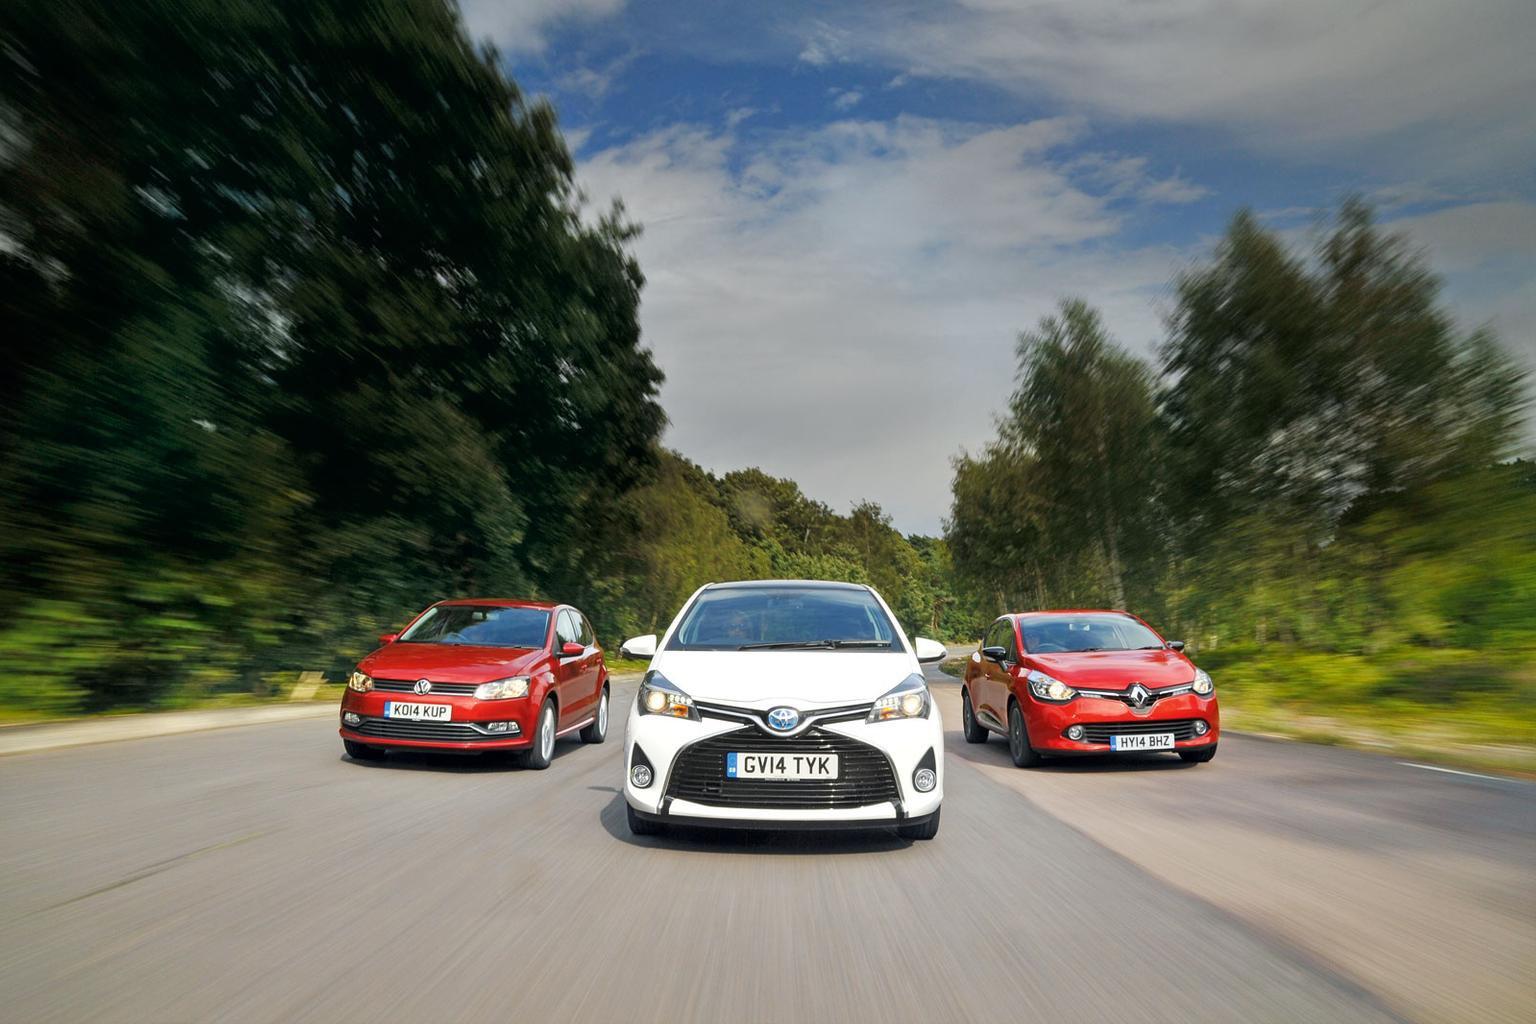 Renault Clio vs Toyota Yaris vs Volkswagen Polo